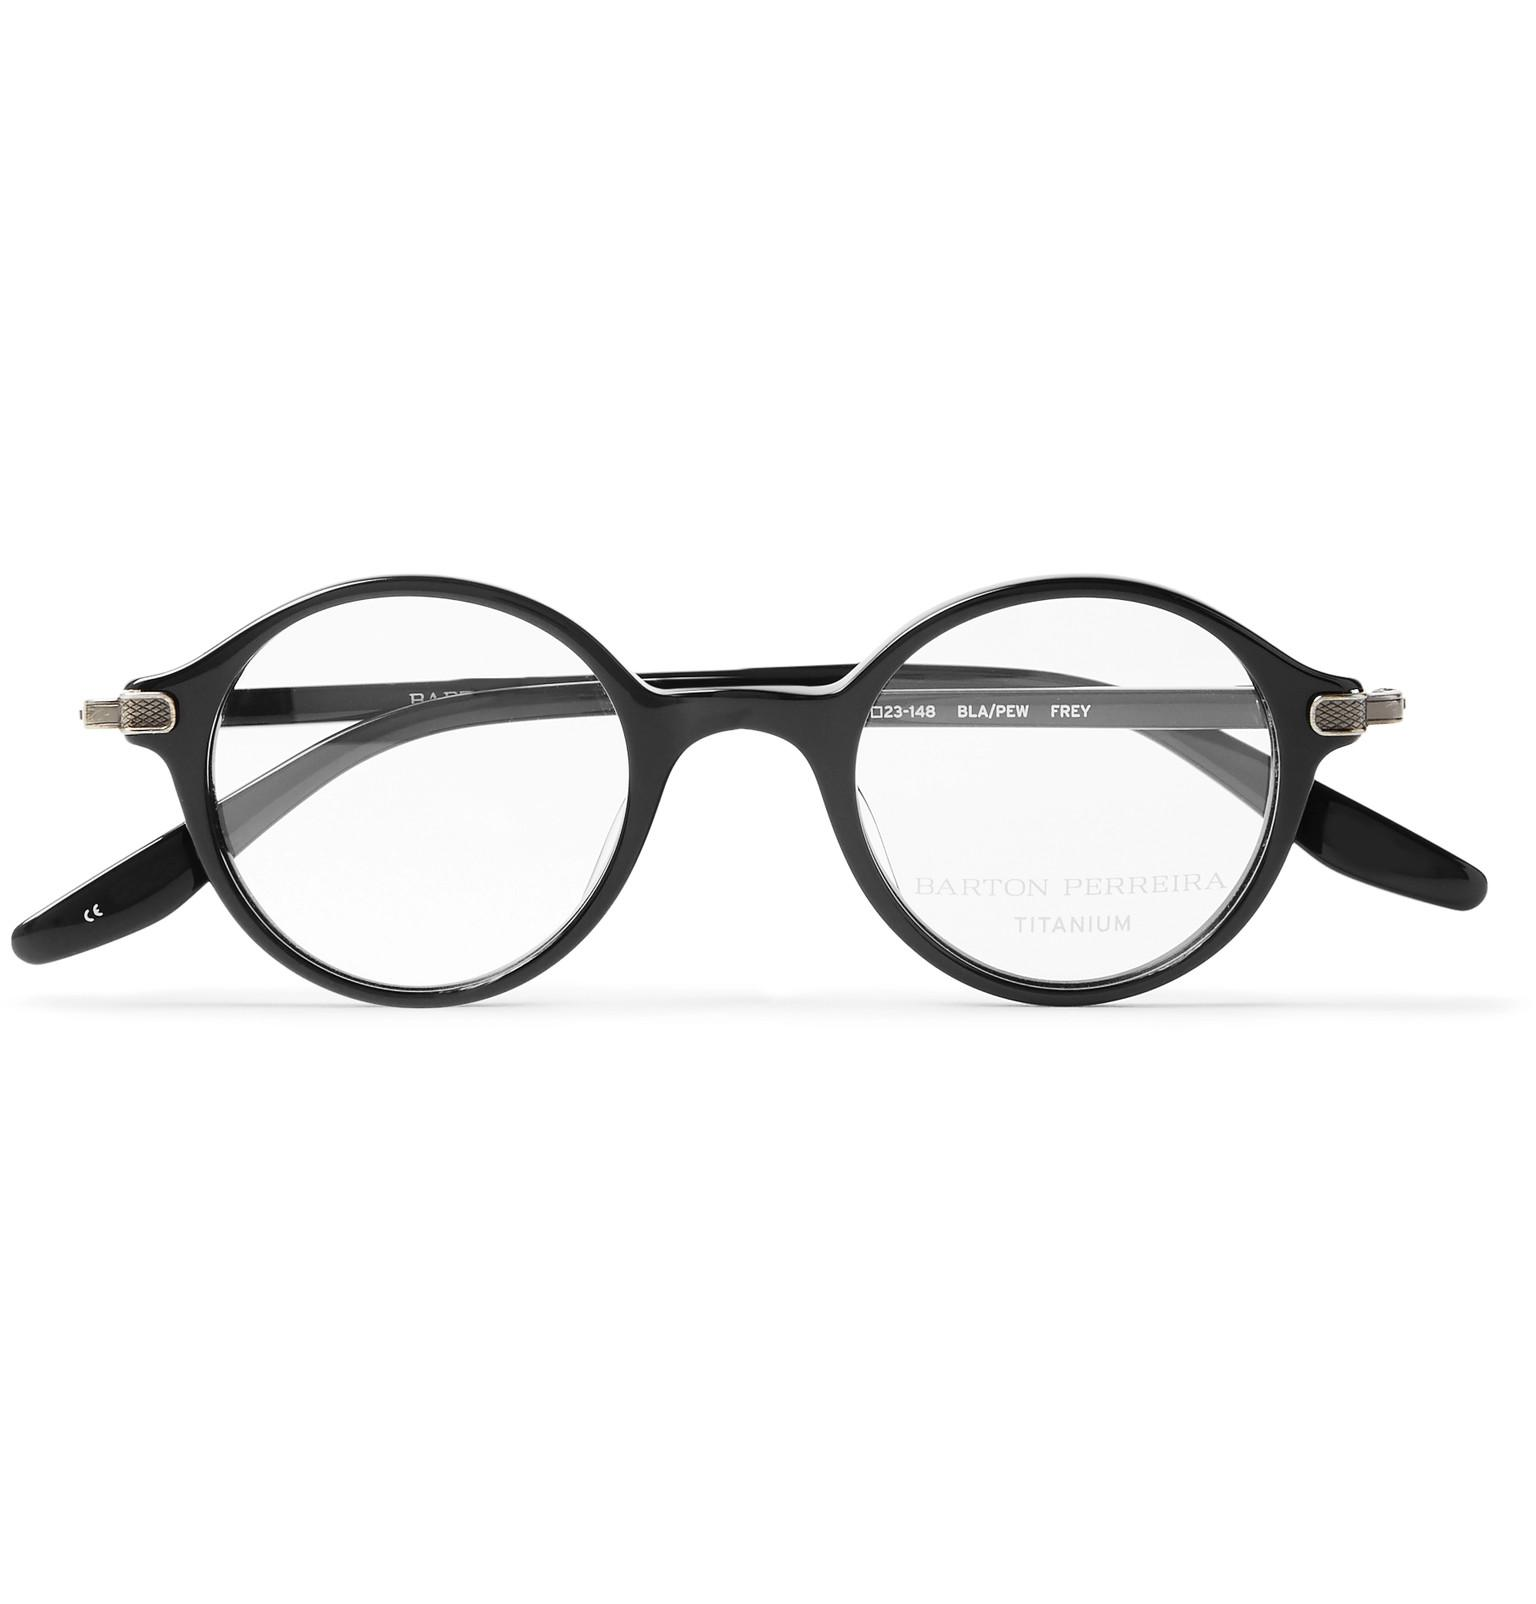 Lyst - Barton Perreira Frey Round-frame Acetate Optical Glasses in ...